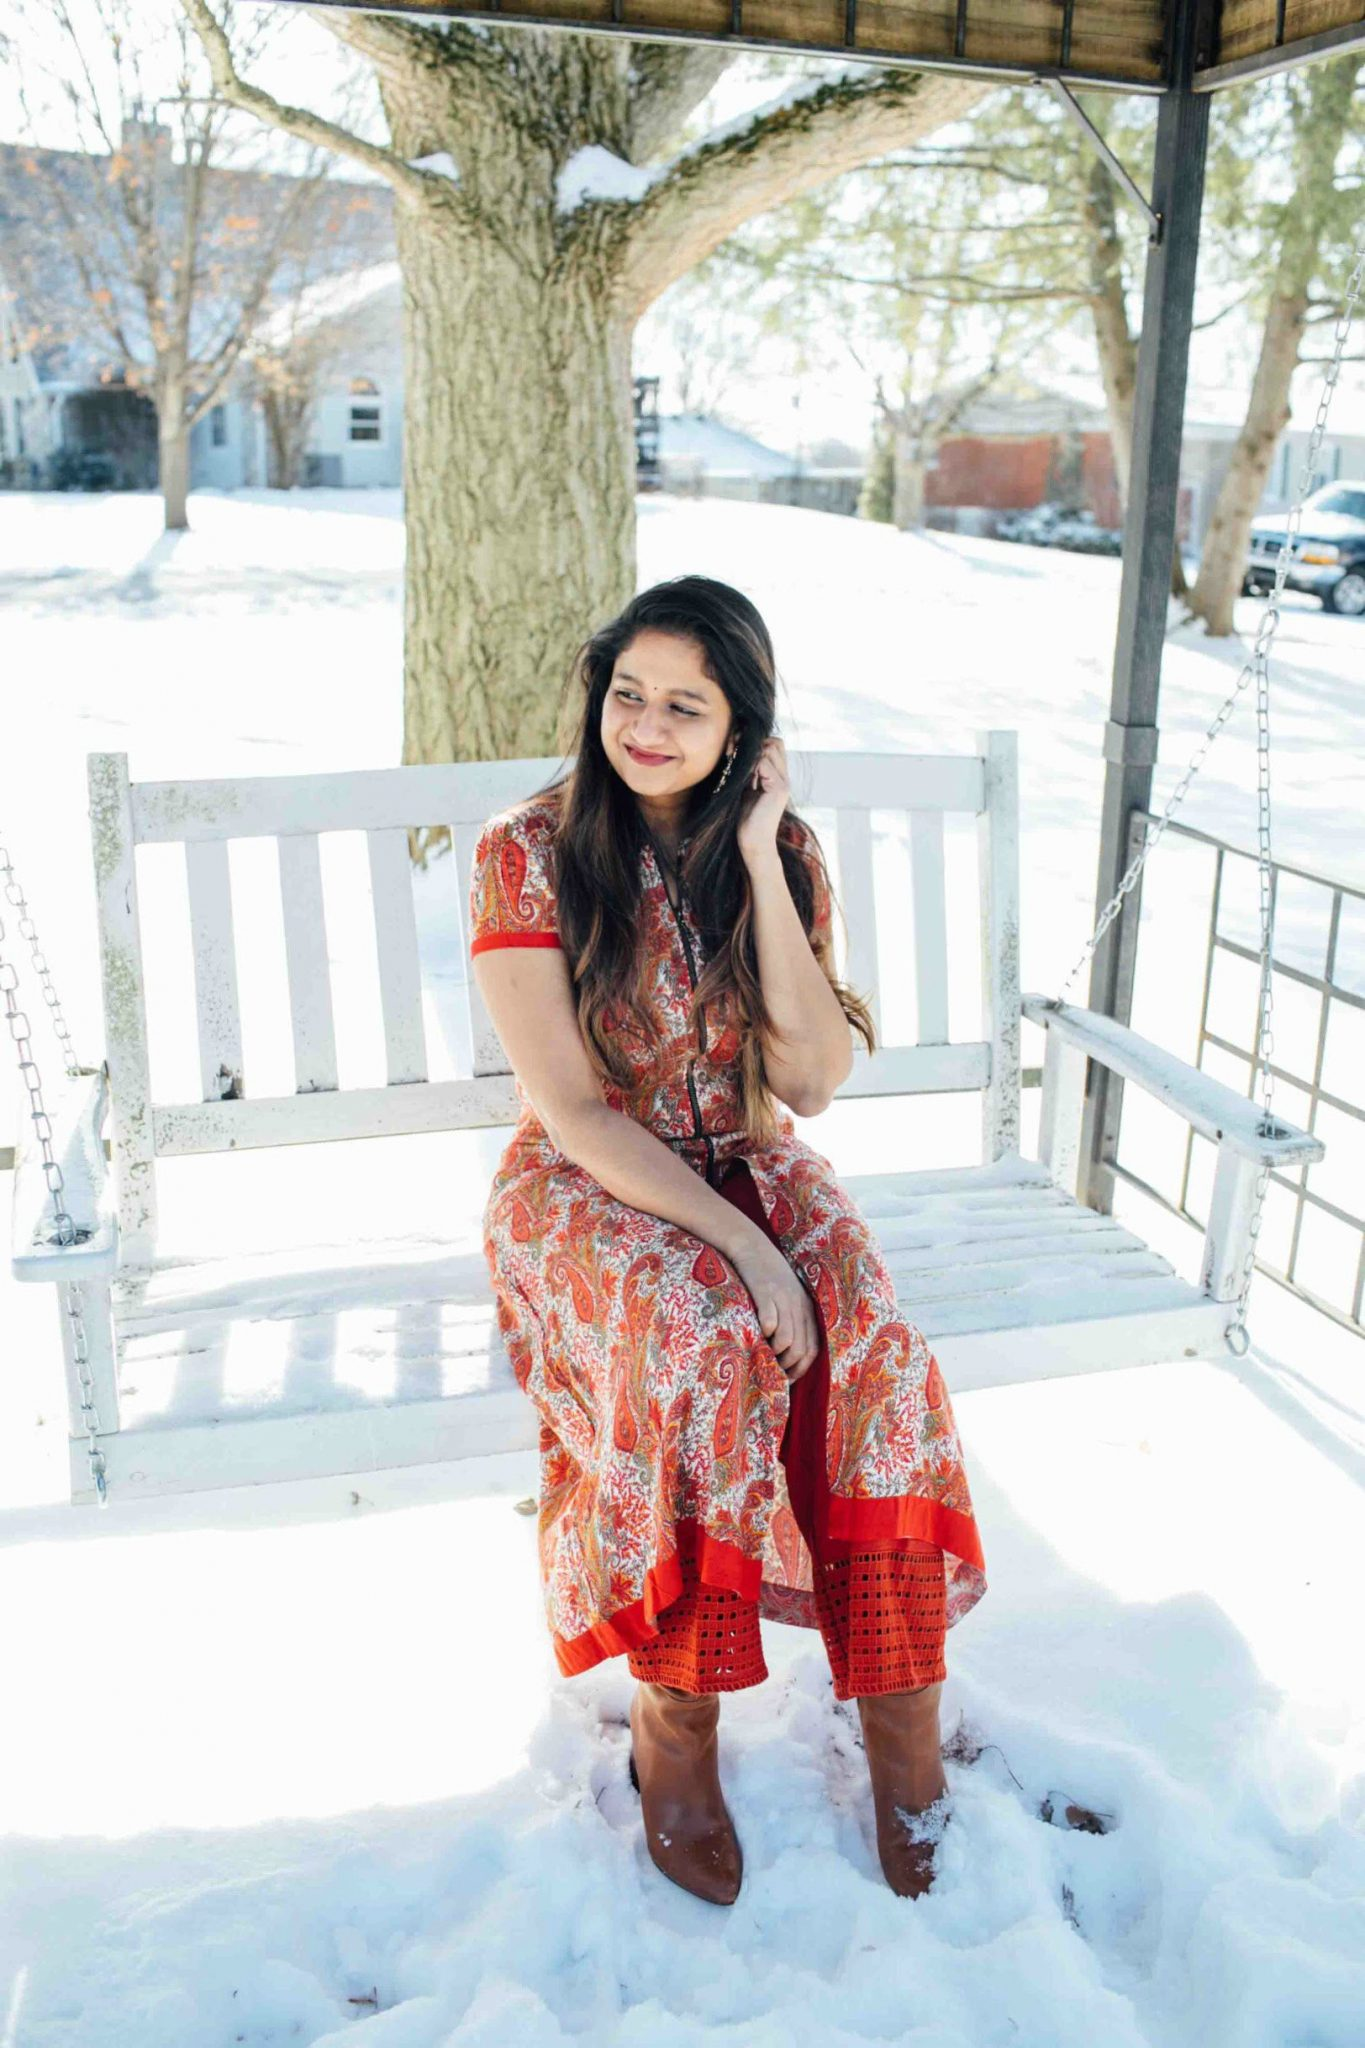 lifestyle blog dreaming loud sharing Makar Sankranti or pongal Outfit